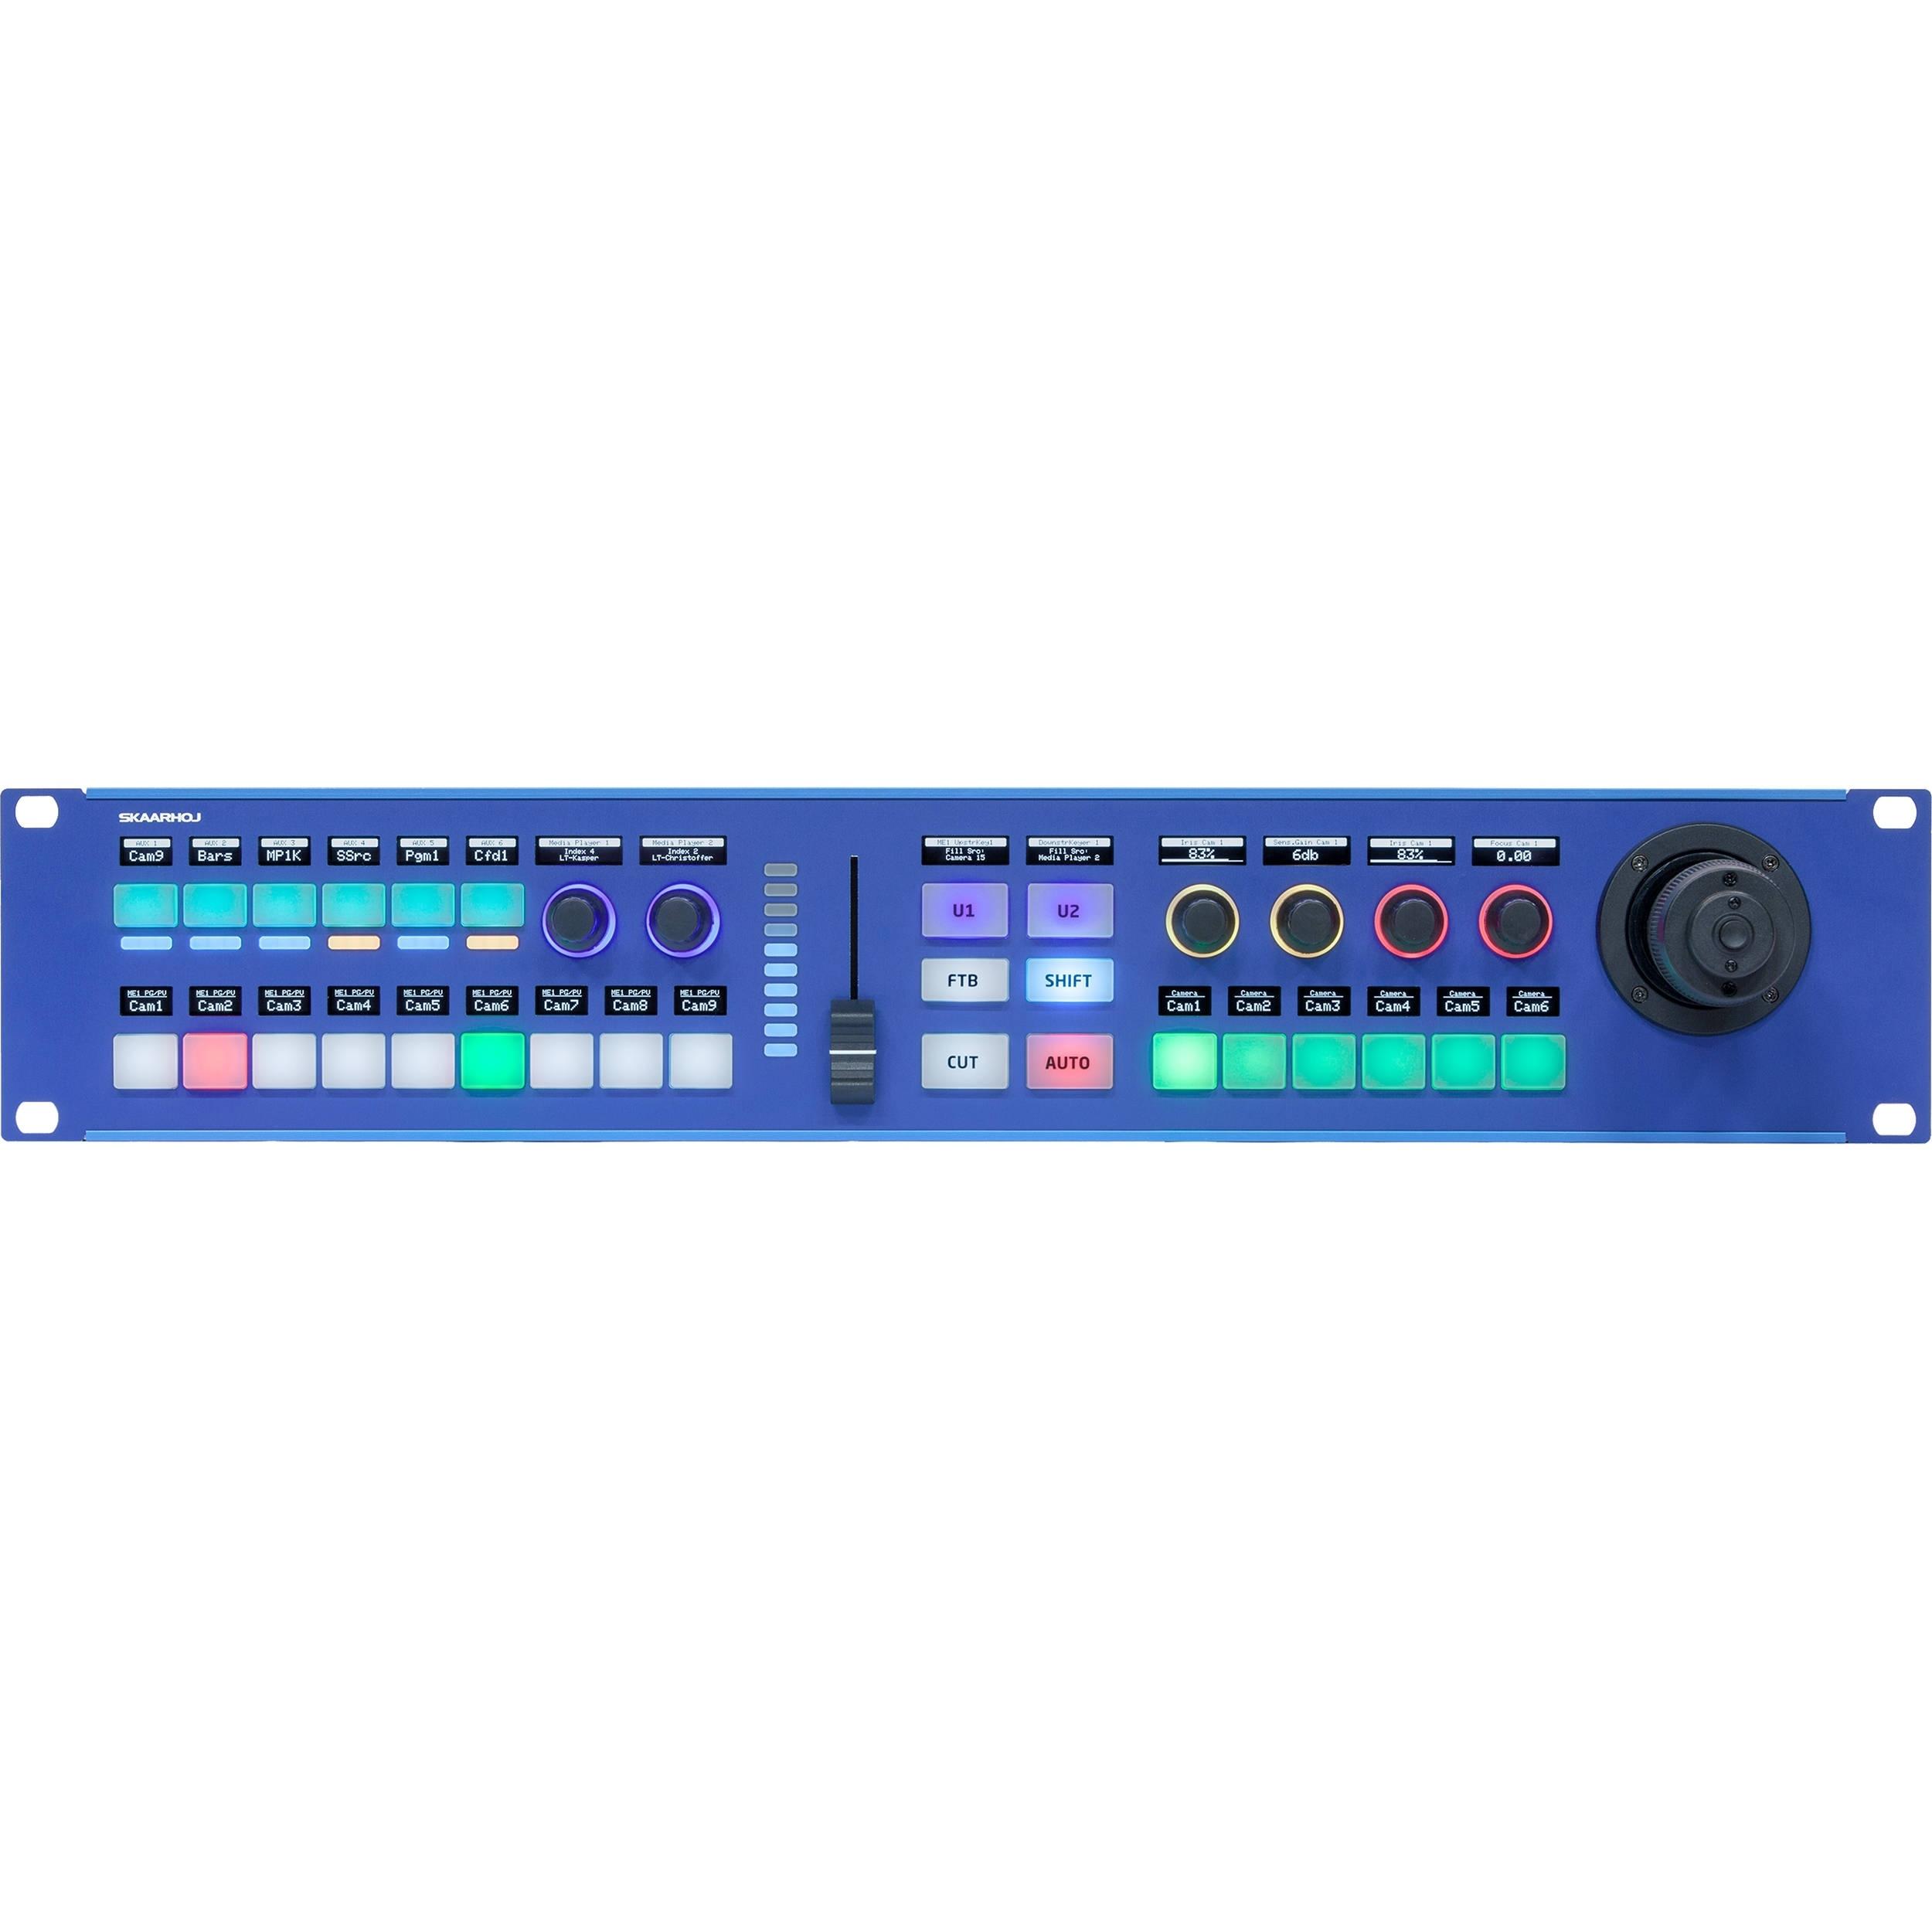 SKAARHOJ Rack Fusion Live PTZ Controller with NKK